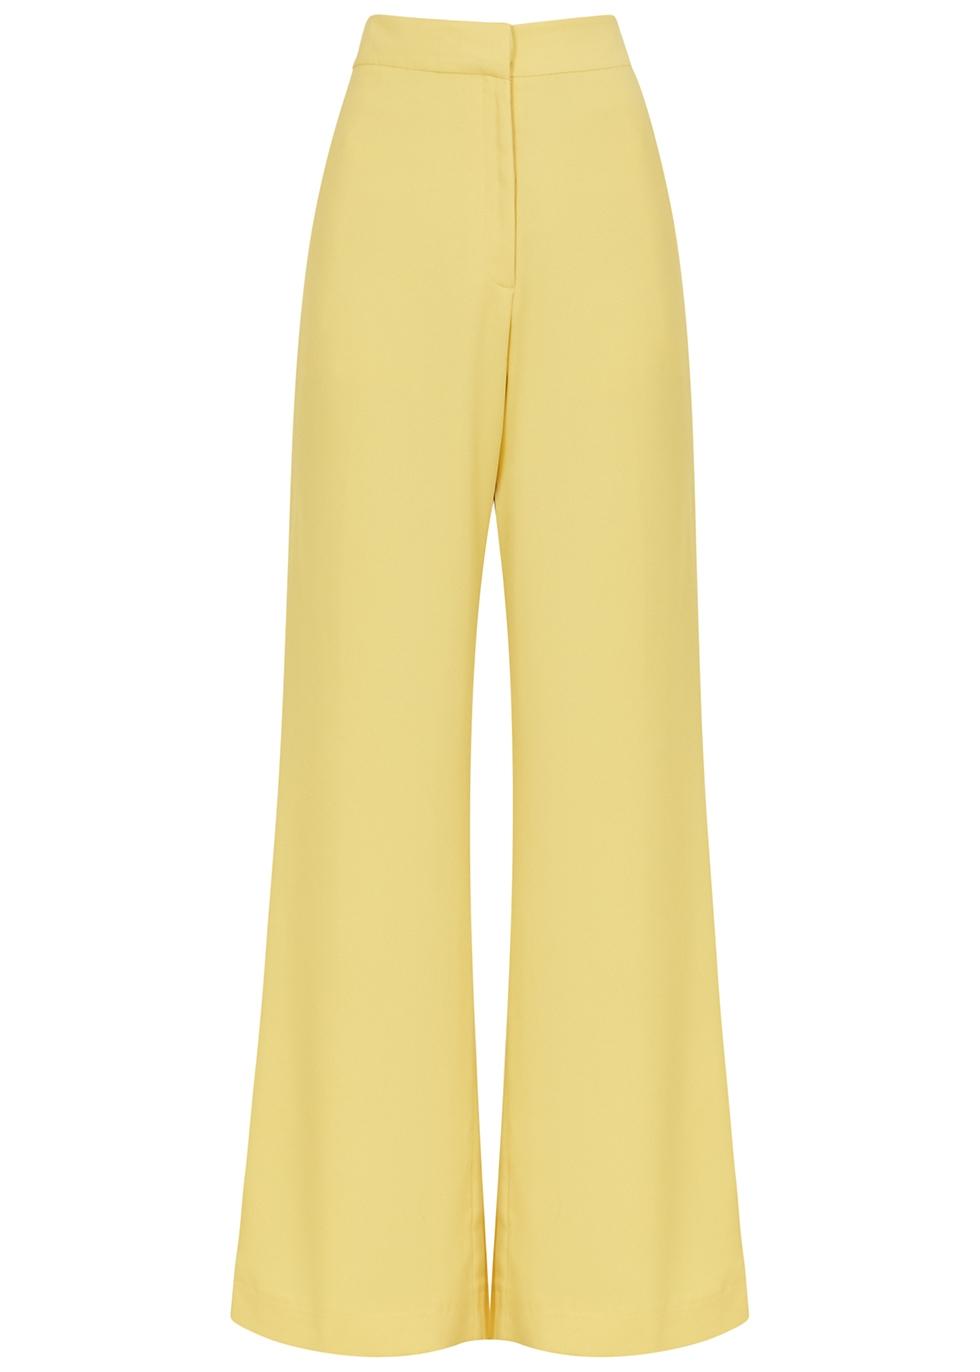 Uma yellow flared trousers